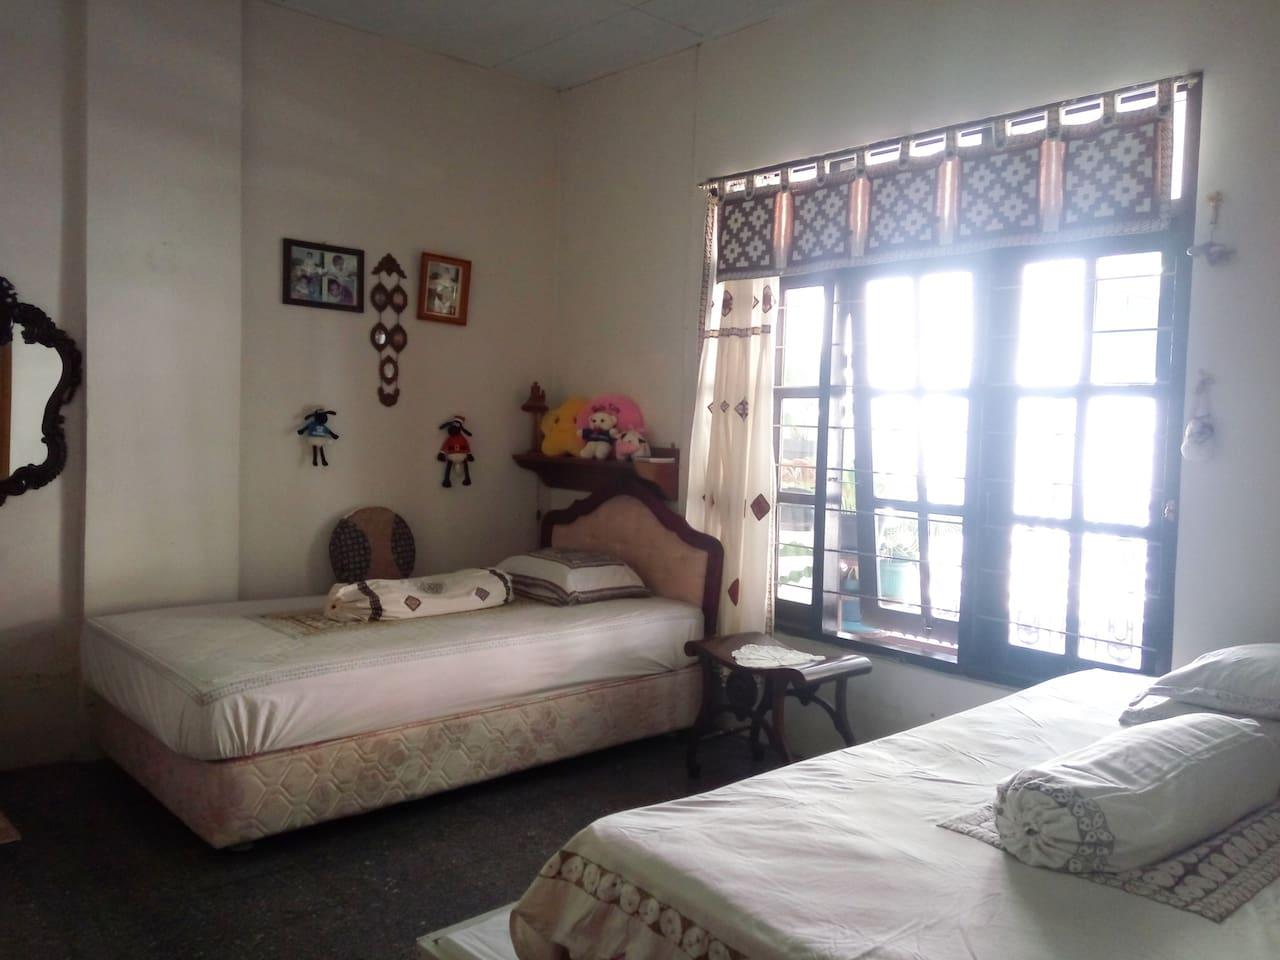 Luas kamar 4x4m2 2 double bed kecil 1 Bed sorong 1 lemari pakaian Kamar Mandi dalam